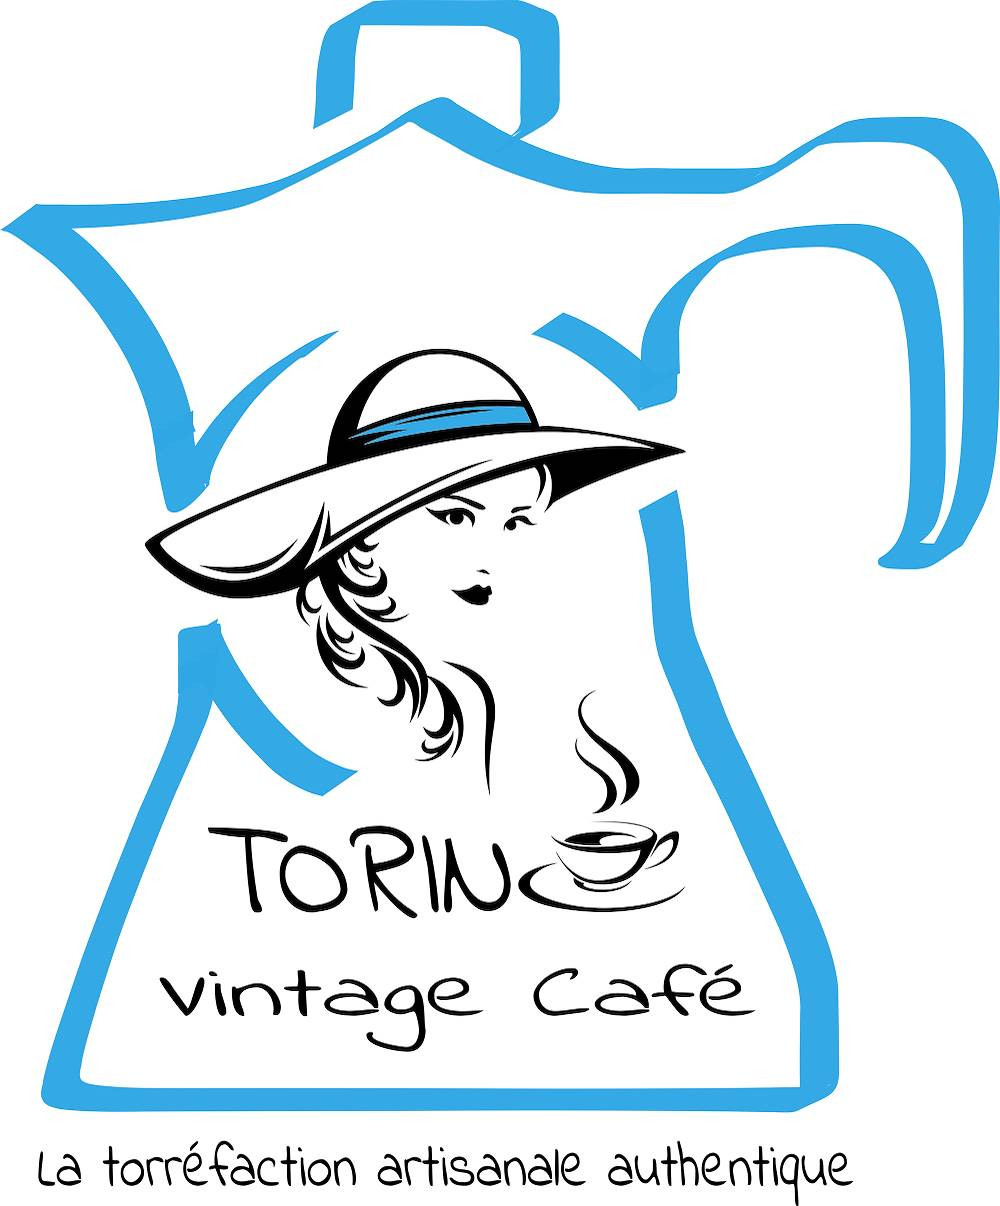 Torino Vintage Café © Torino Vintage Café